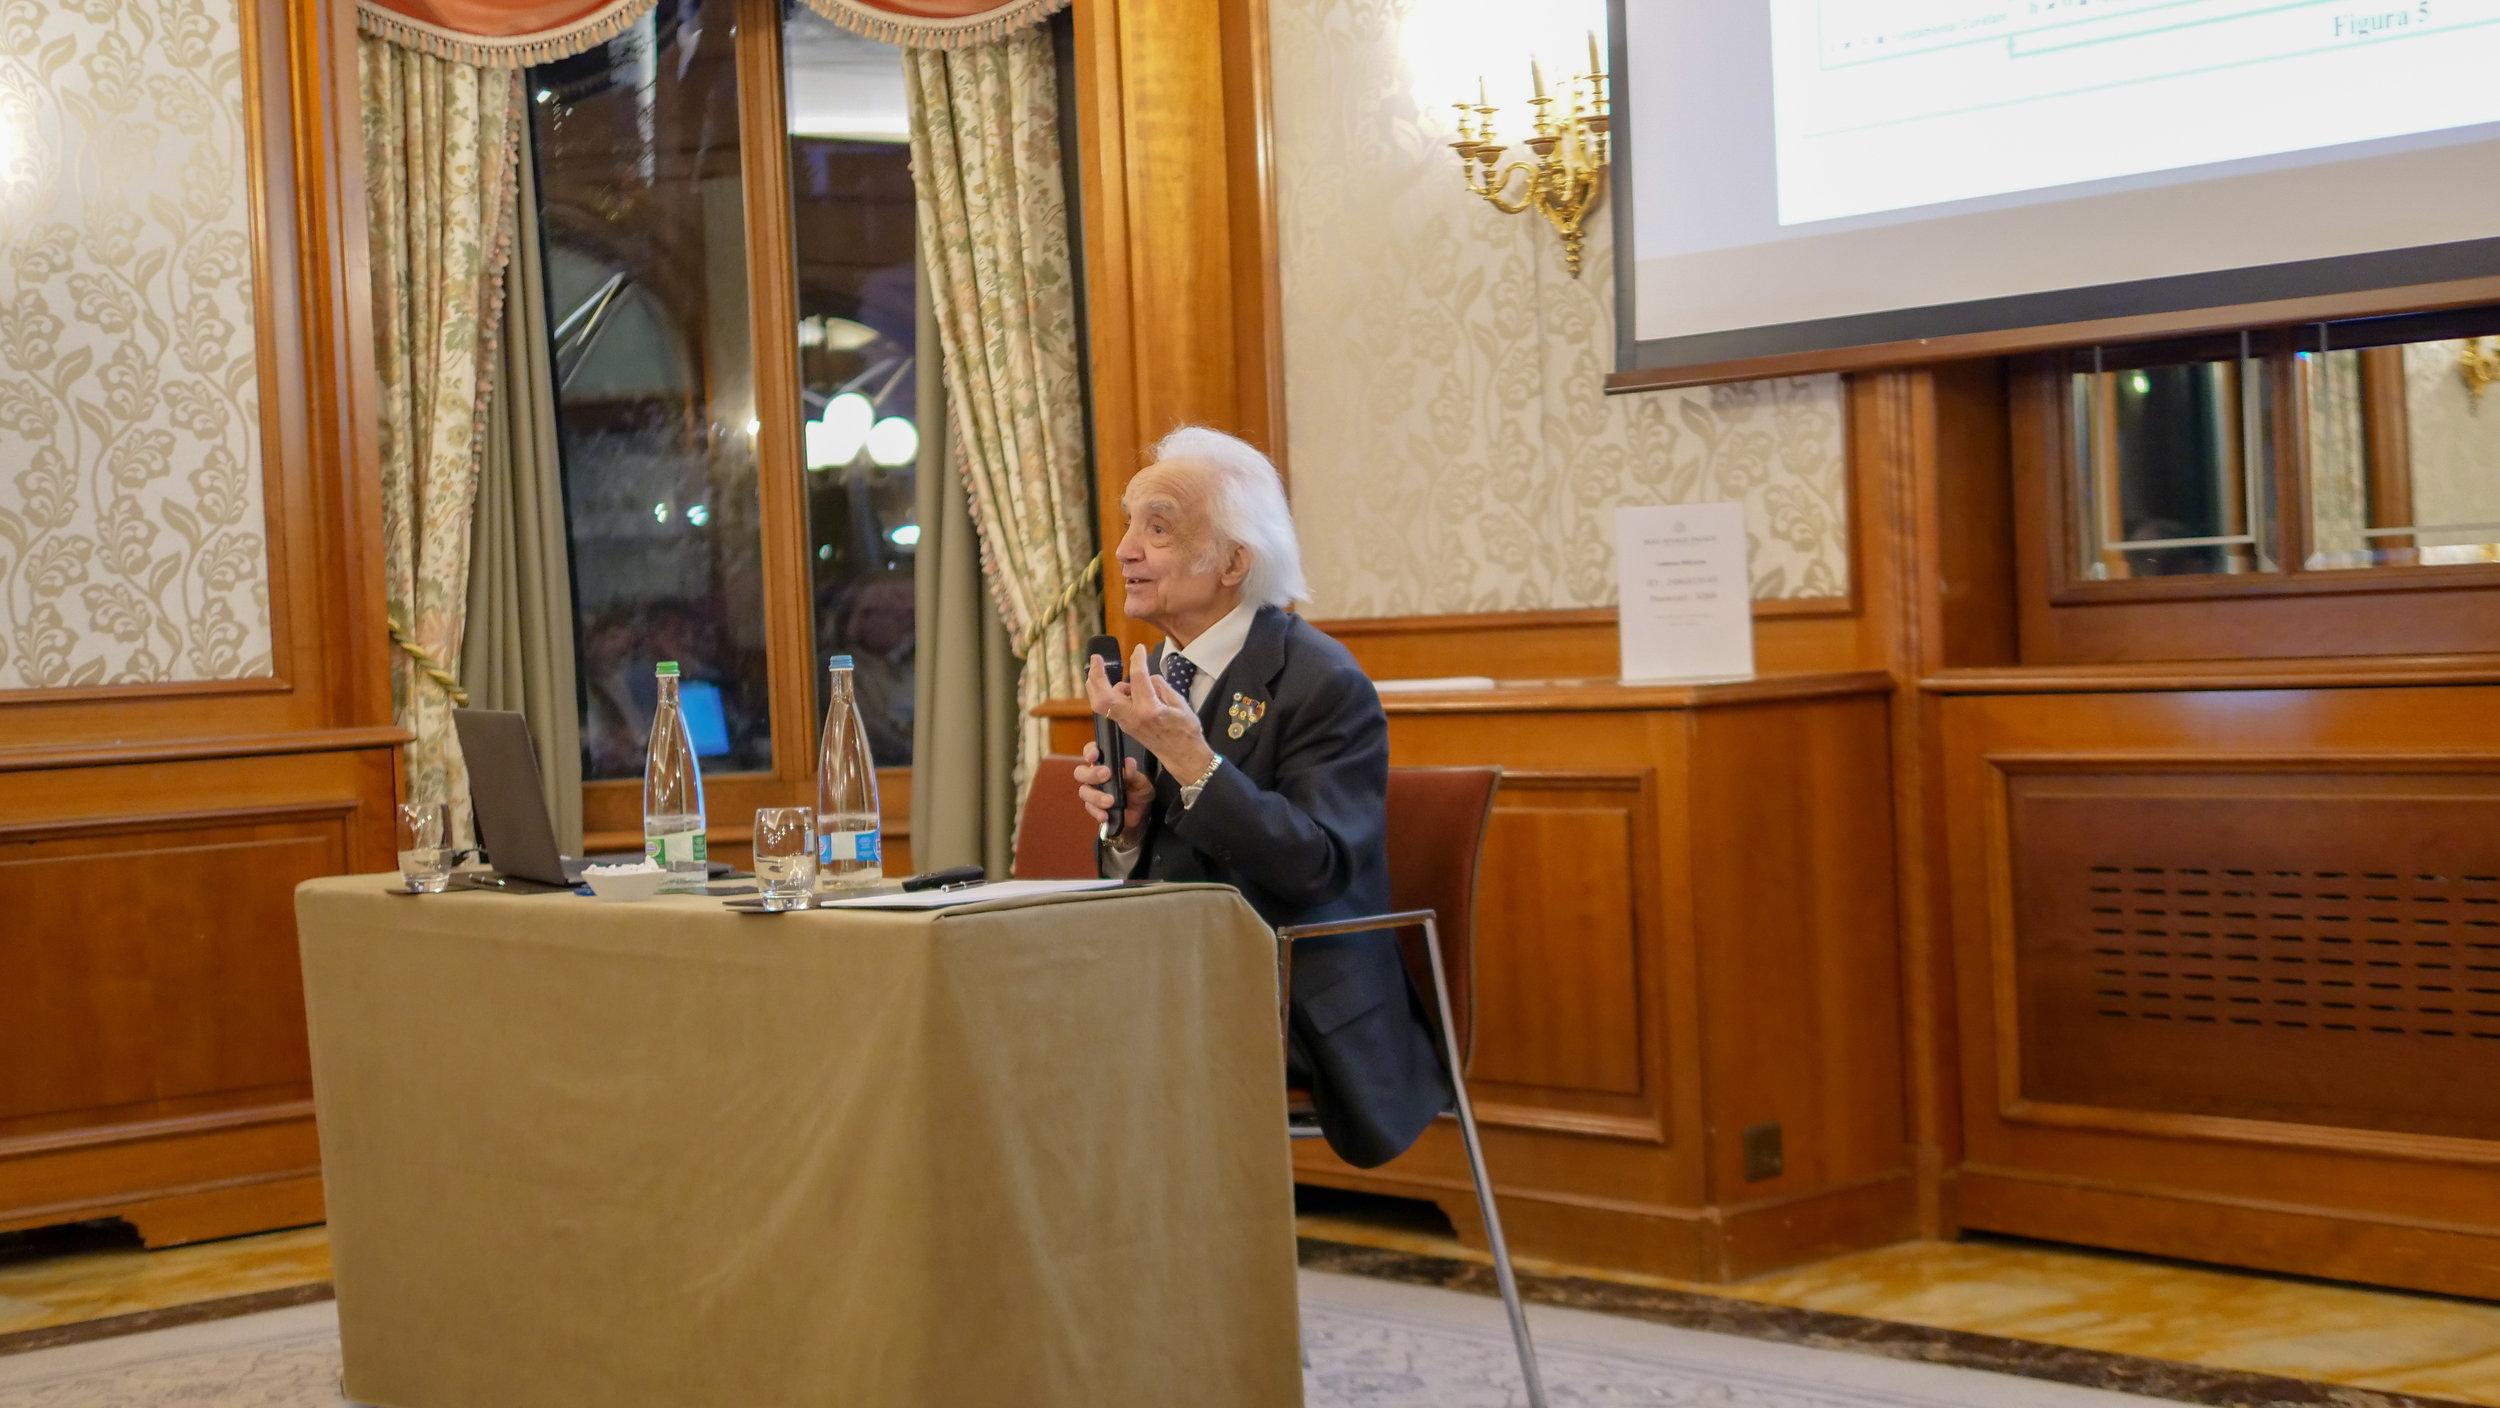 Conferenza 11.04 - A.Zichichi - 42.jpg